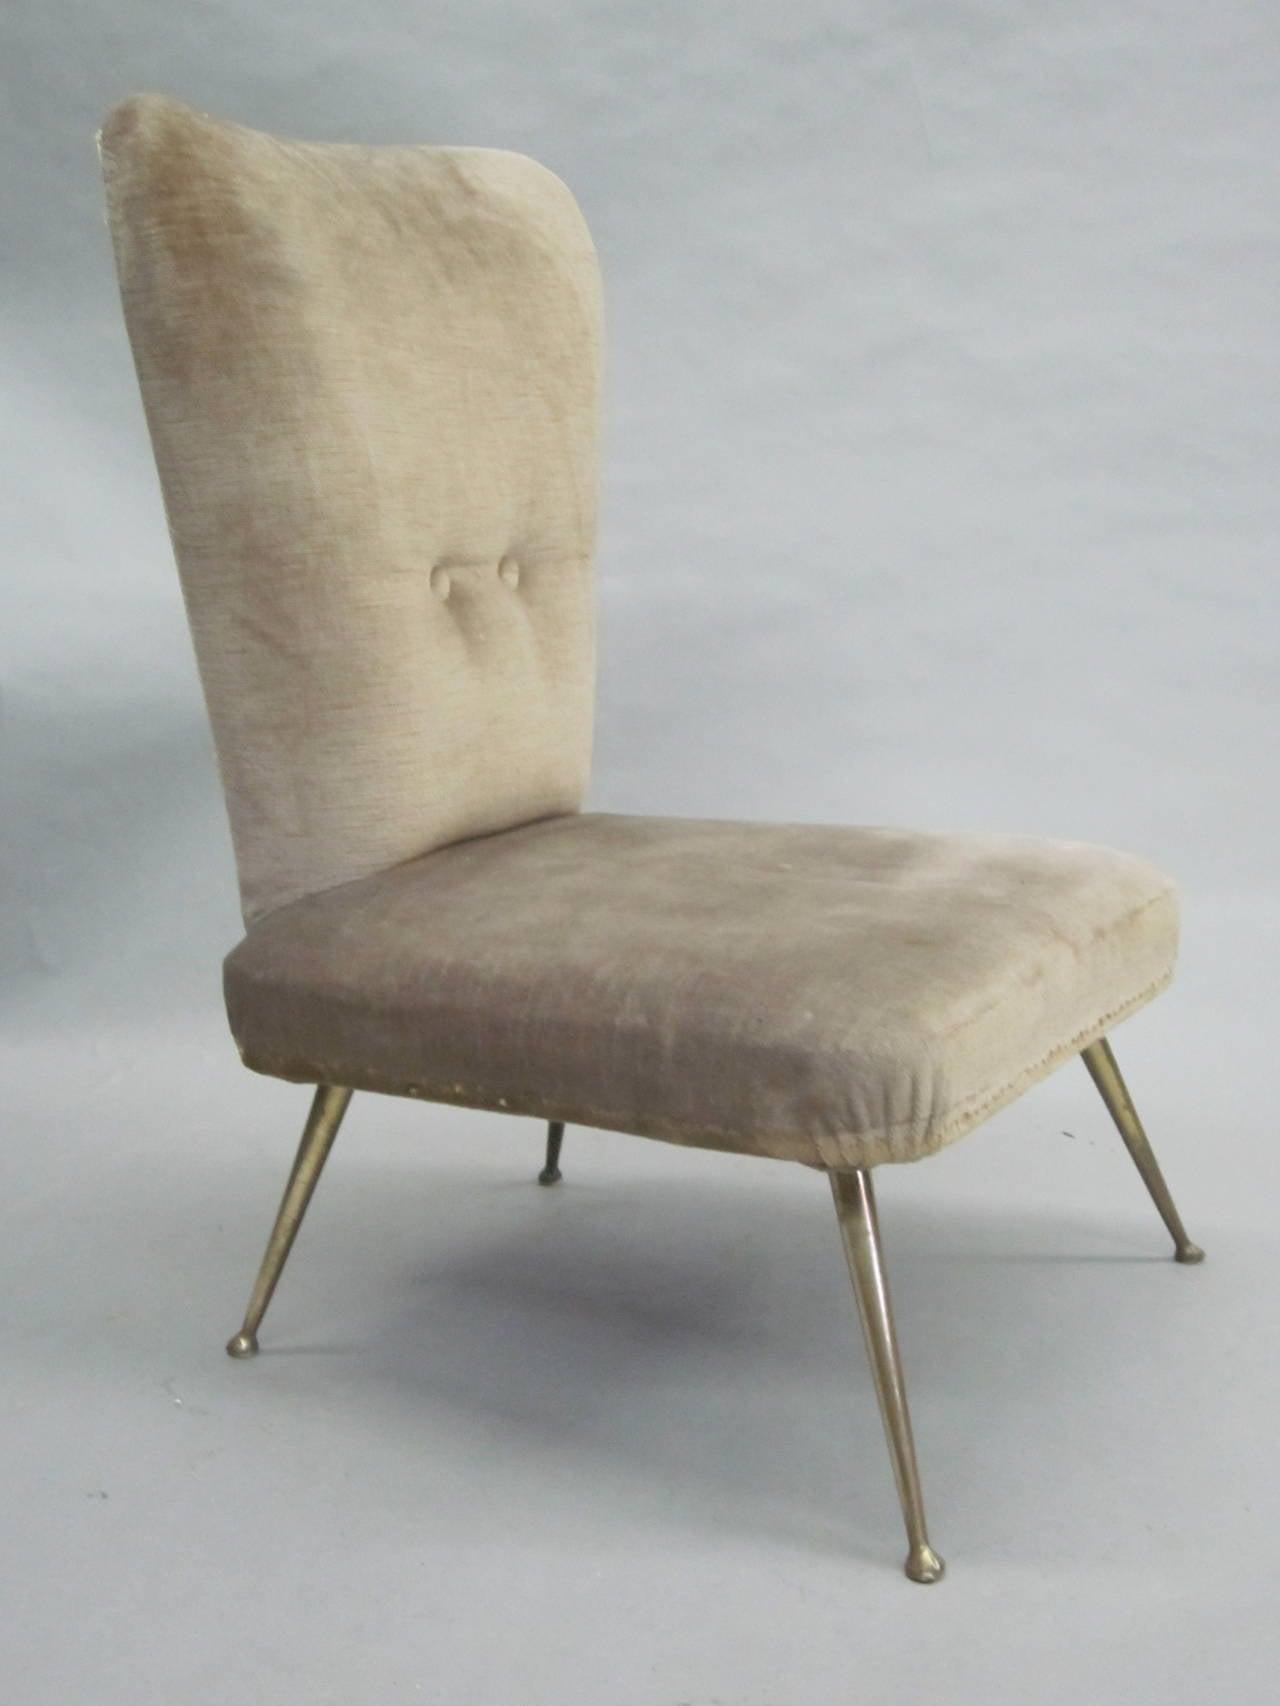 Pair of Italian Mid-Century Slipper Chairs Attributed to Marco Zanuso 2